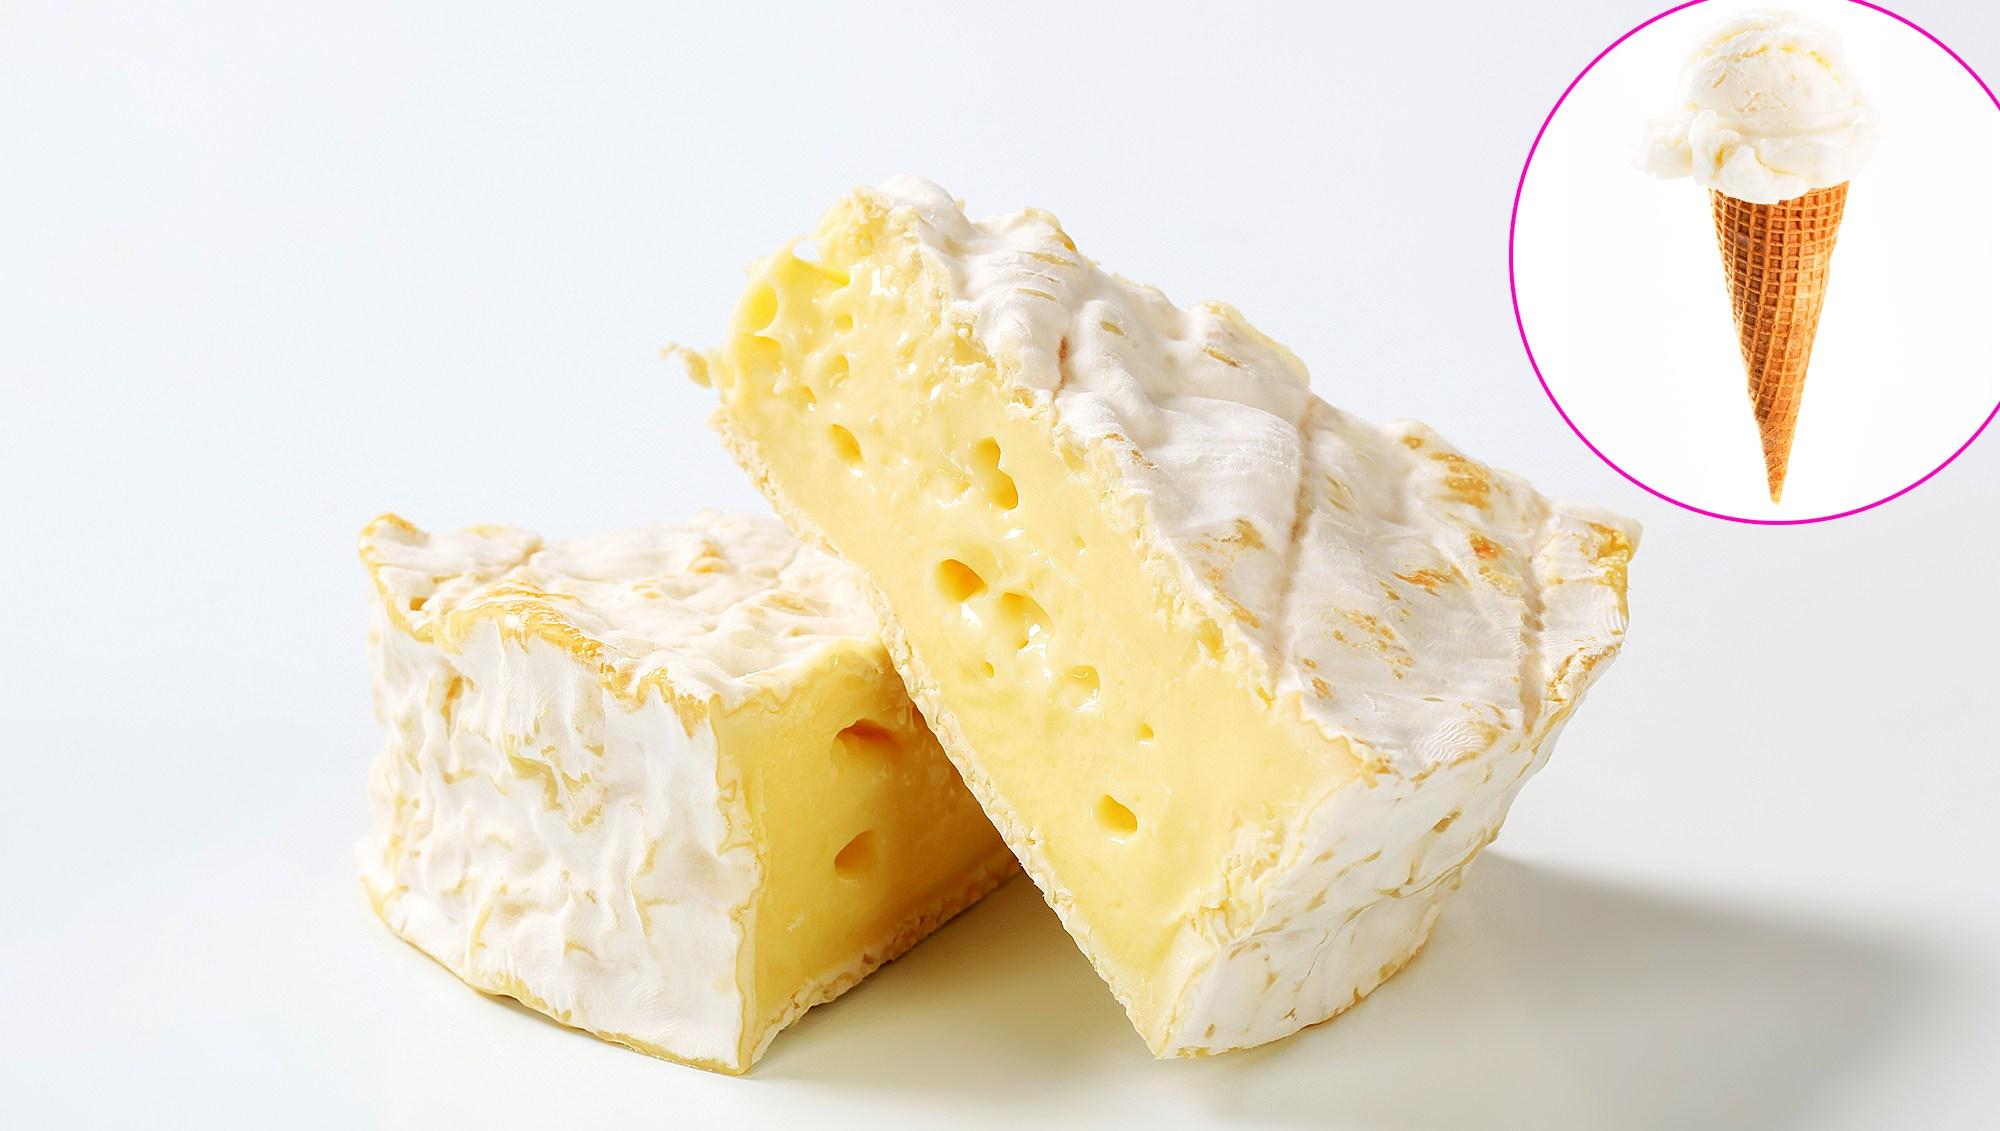 Brie Cheese Ice Cream